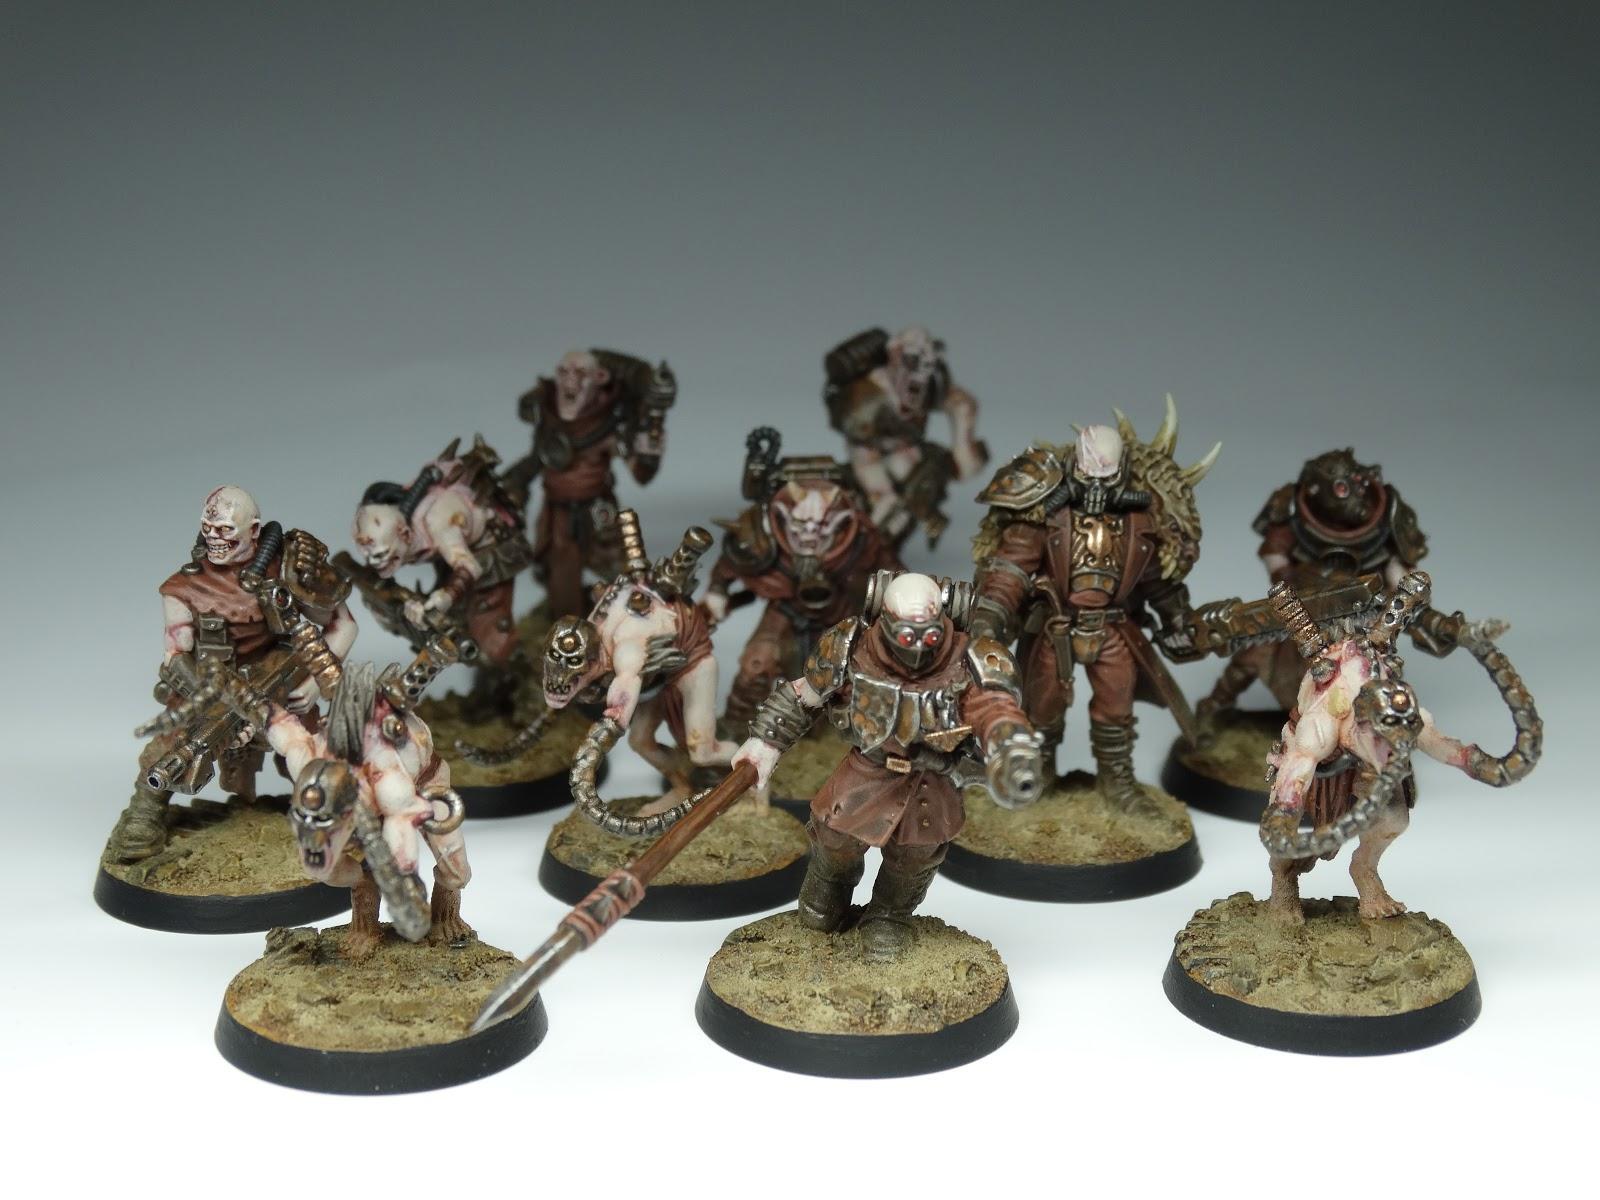 Ash Wastes, Carrion Pass, Conversion, Inq28, Inquisimunda, Killteam28, Kitbash, Necromunda, Warhammer 40,000